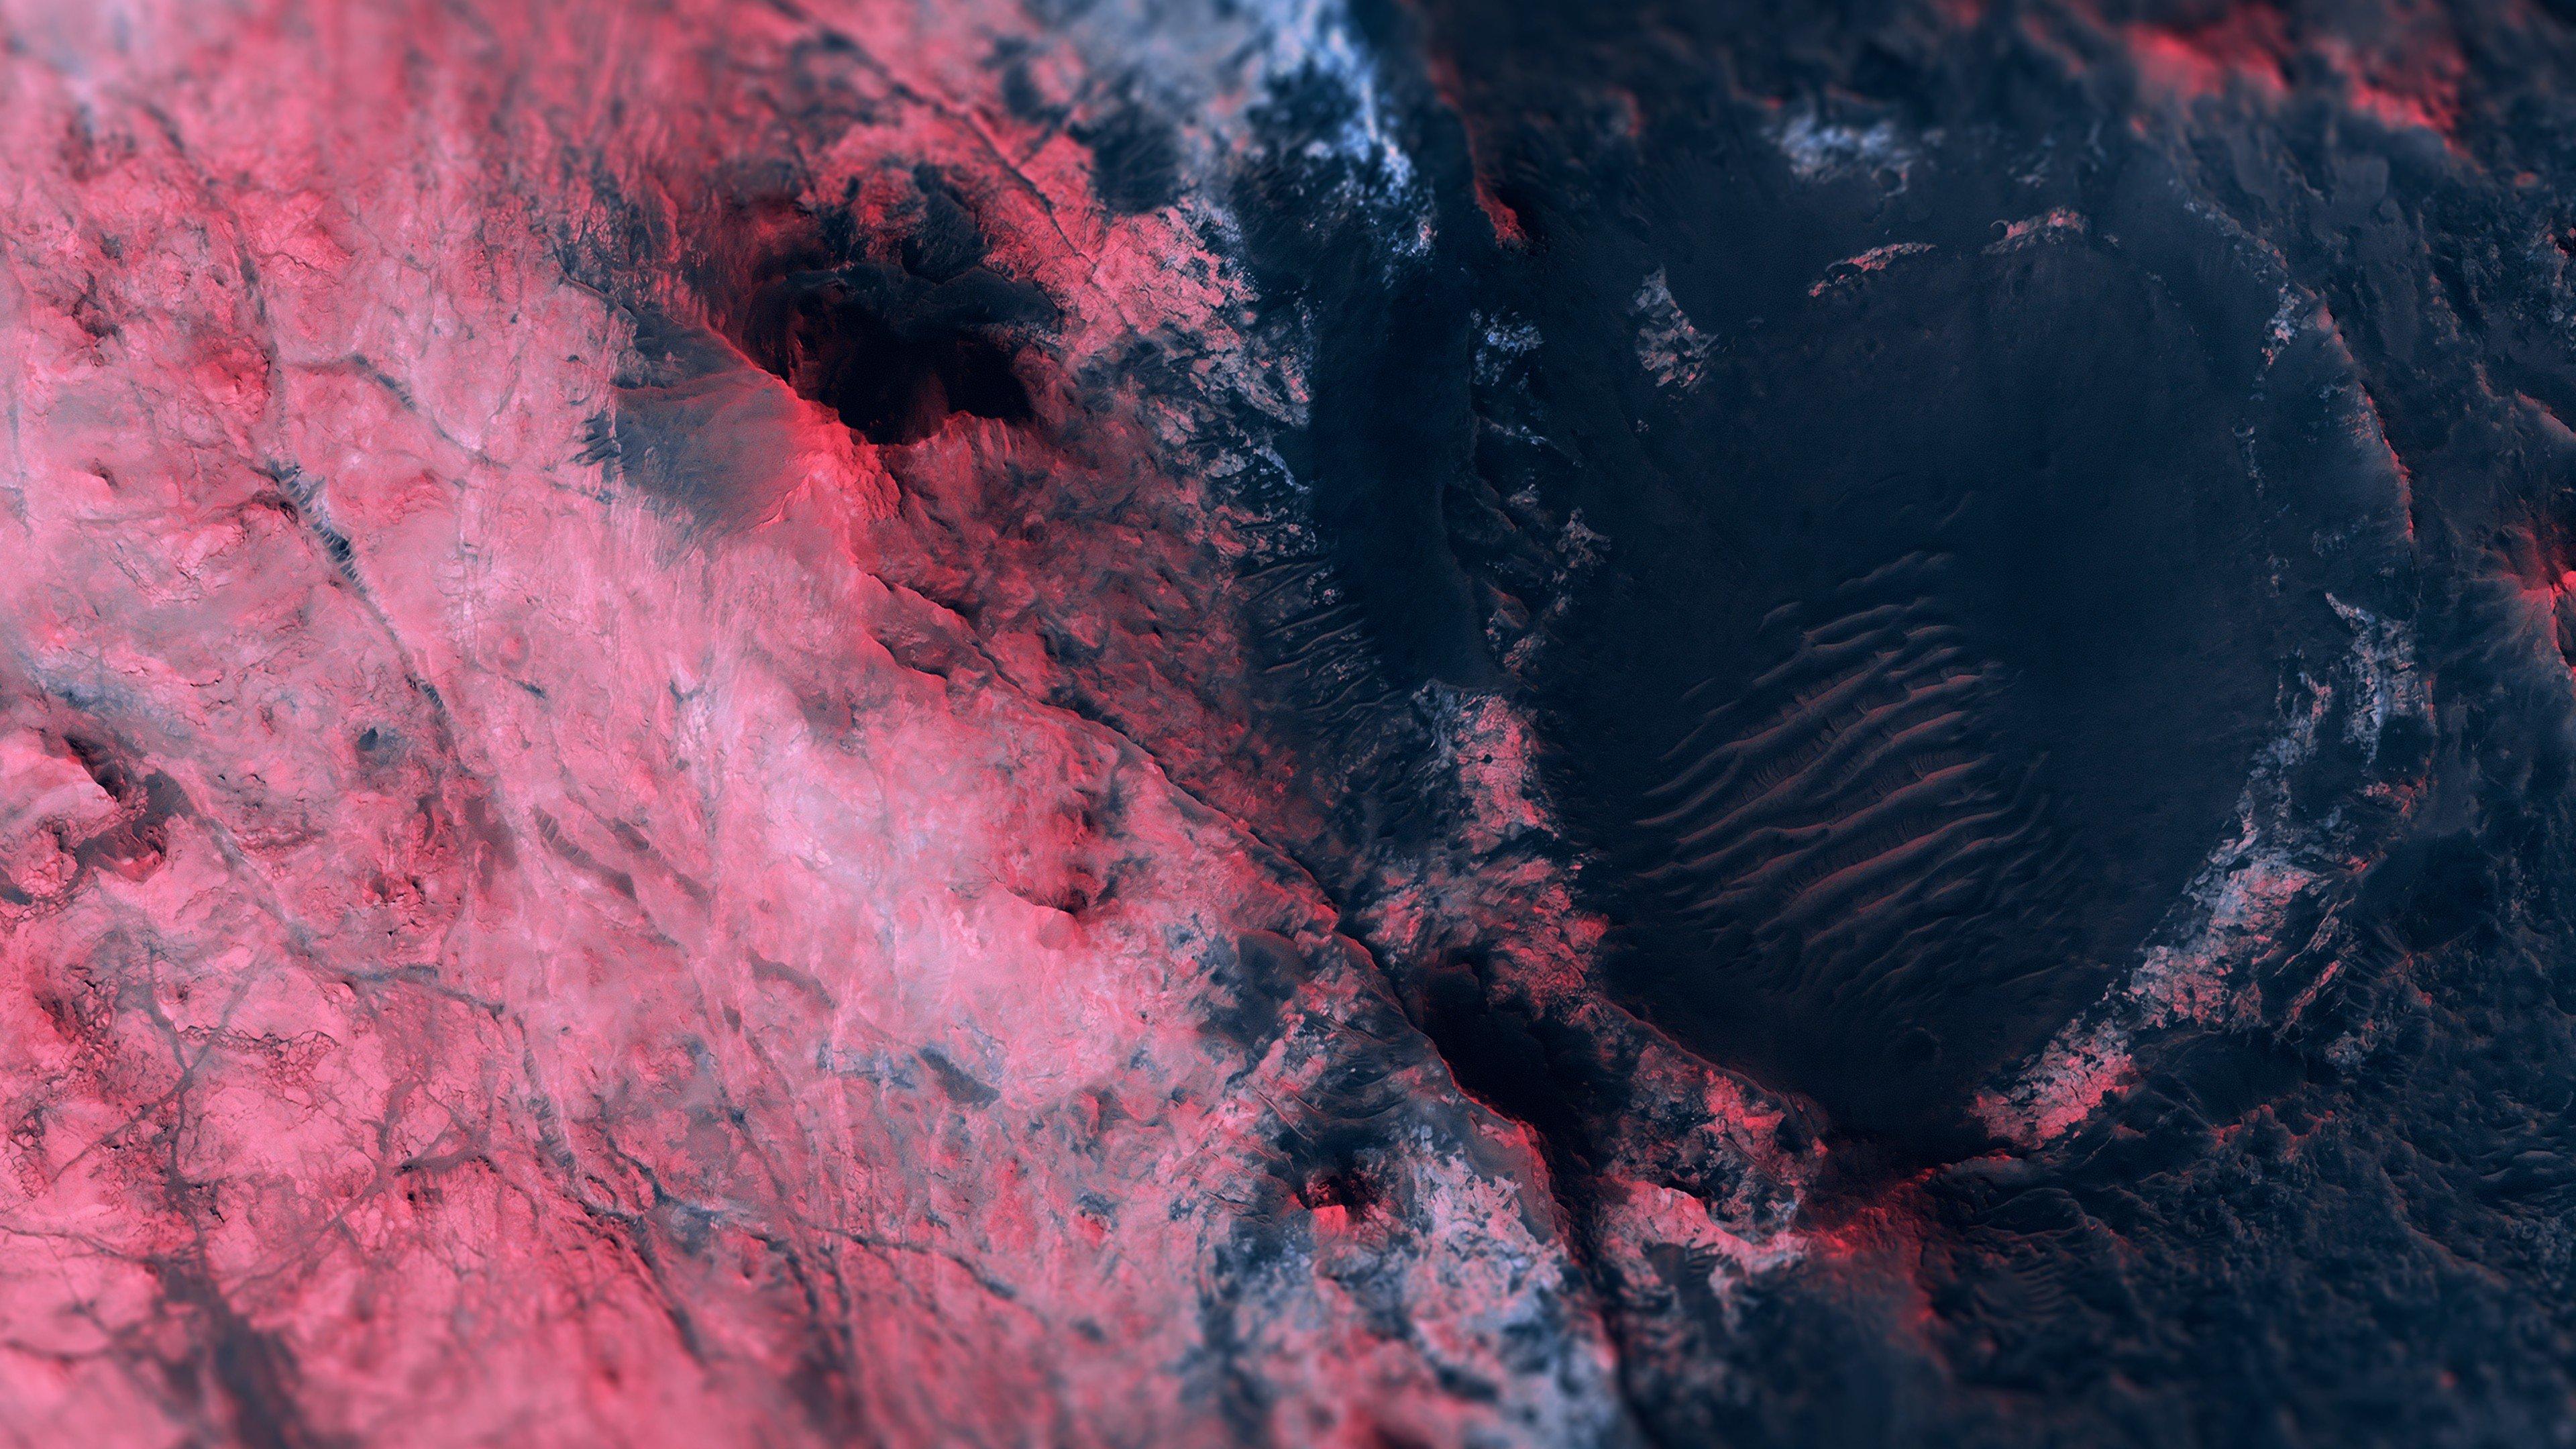 Space nasa hd wallpapers desktop and mobile images photos - Nasa space wallpaper hd ...